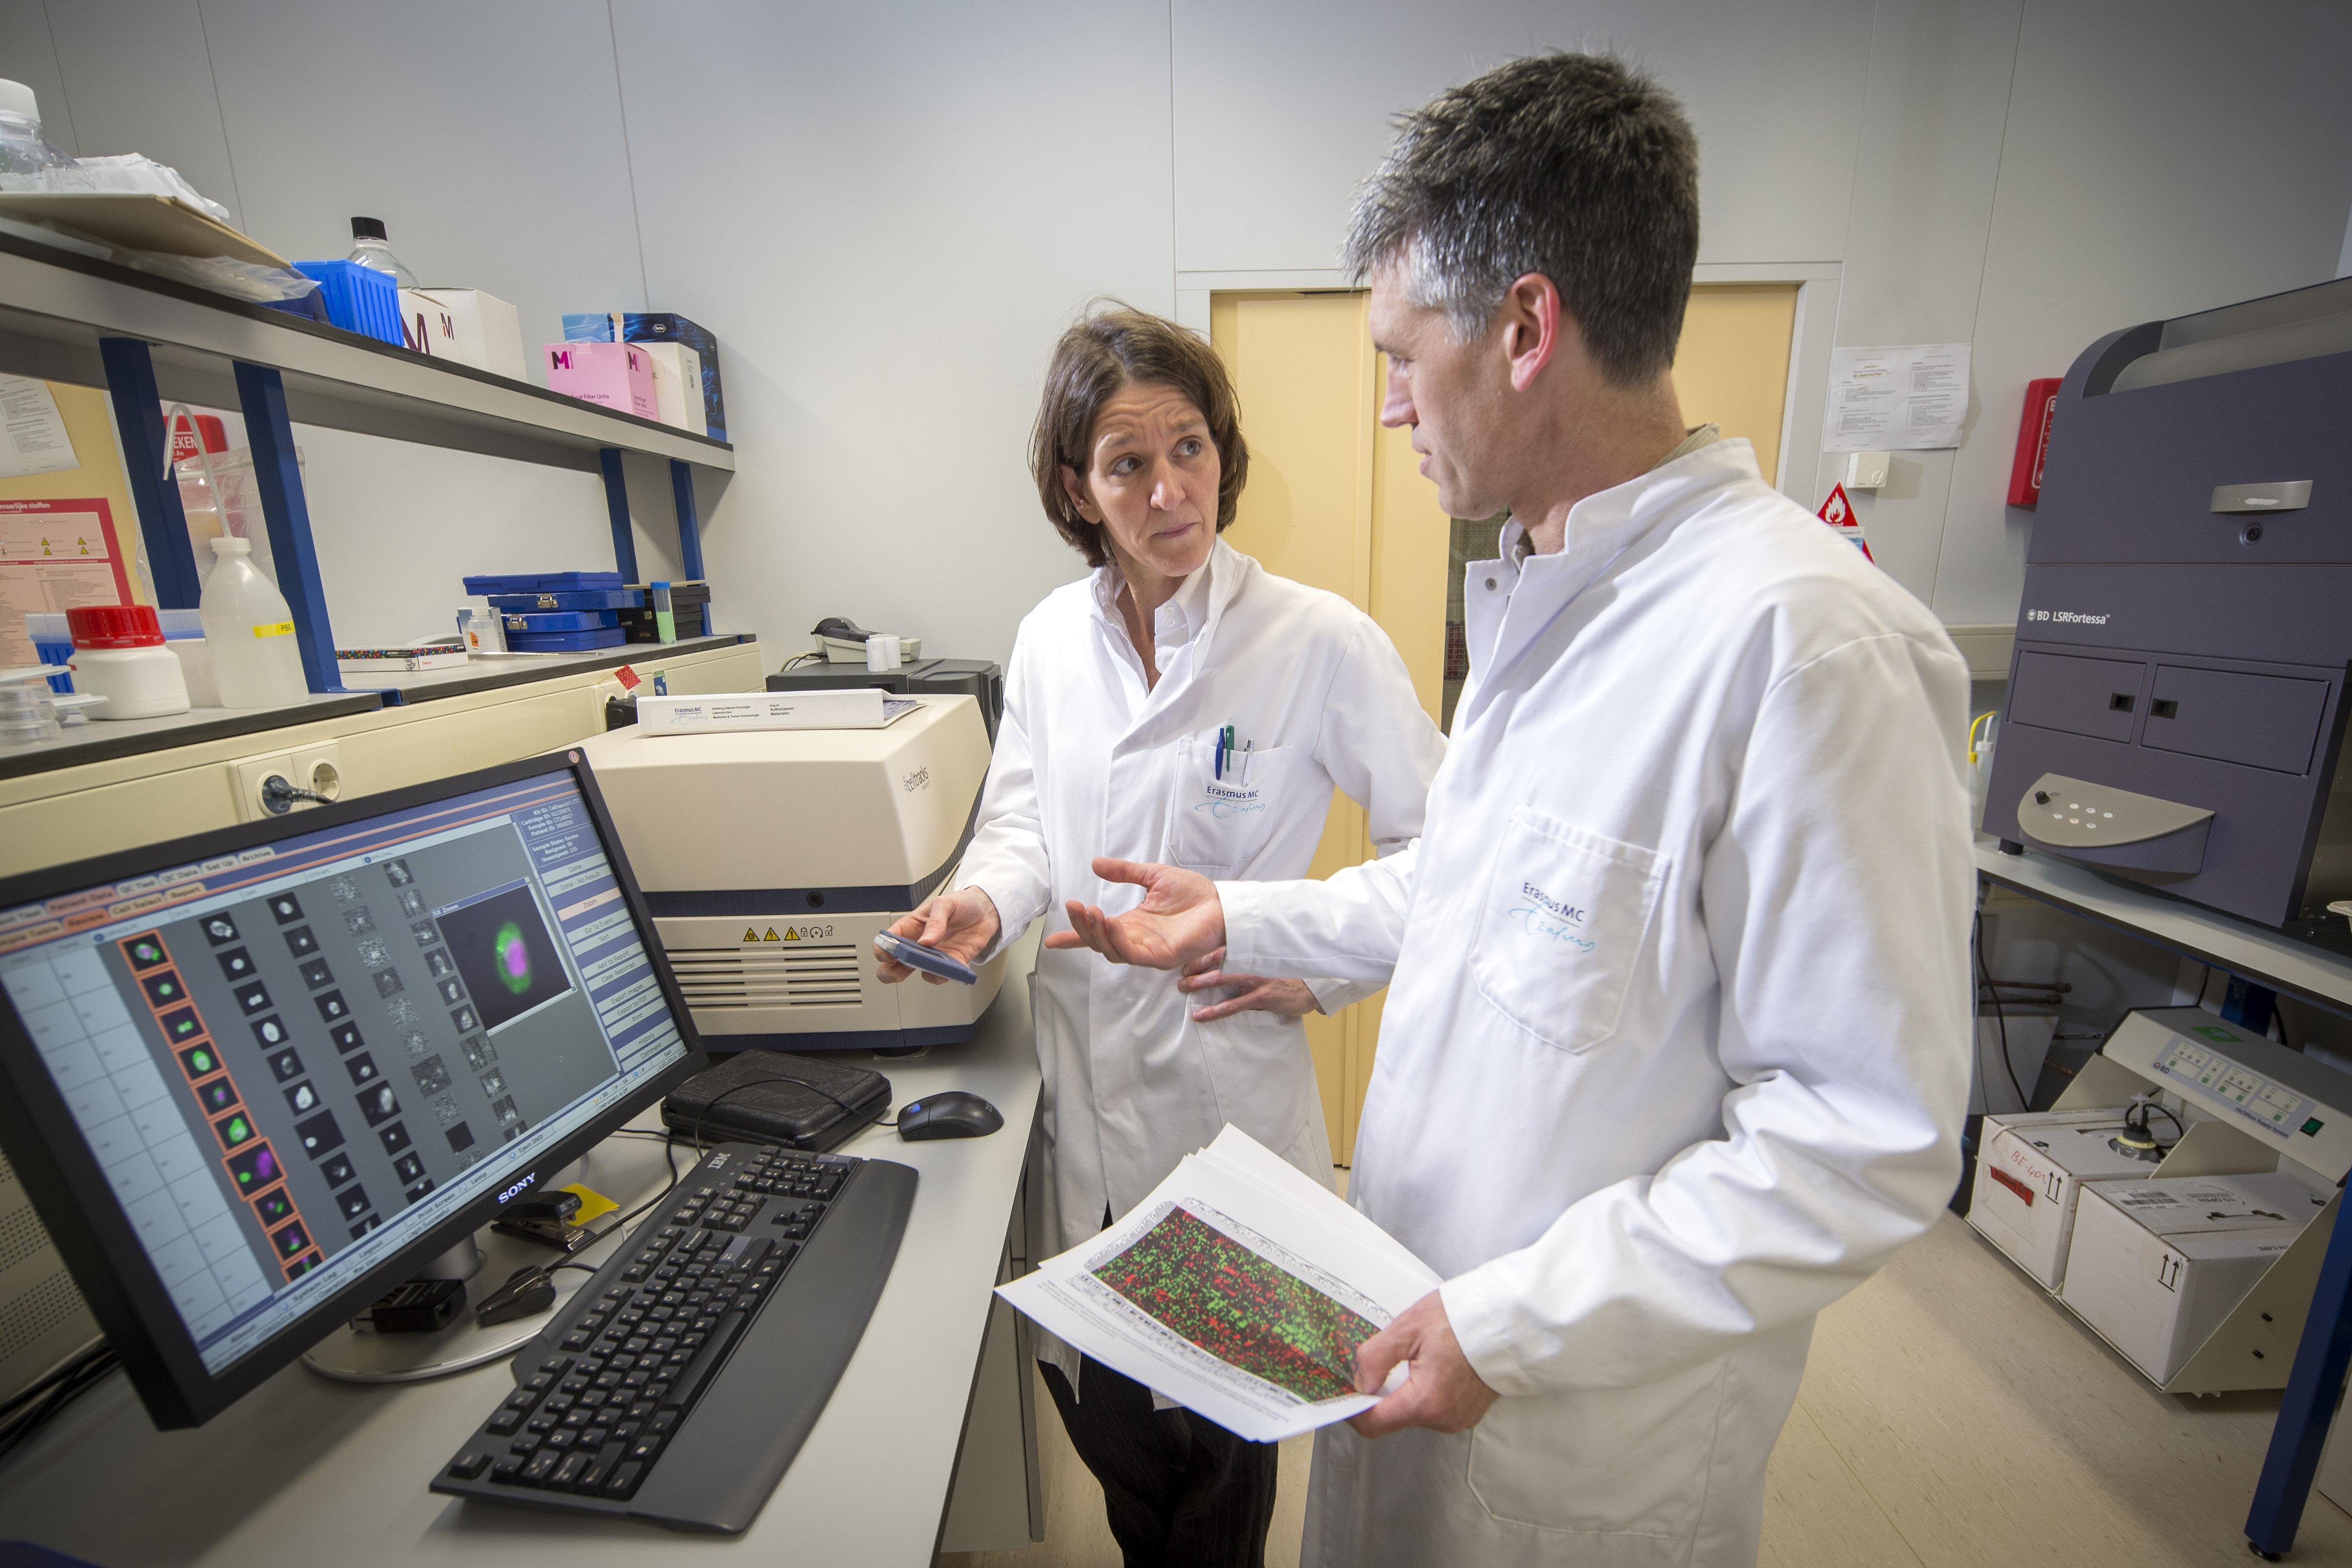 internist-oncoloog Agnes Jager en onderzoeker John Martens